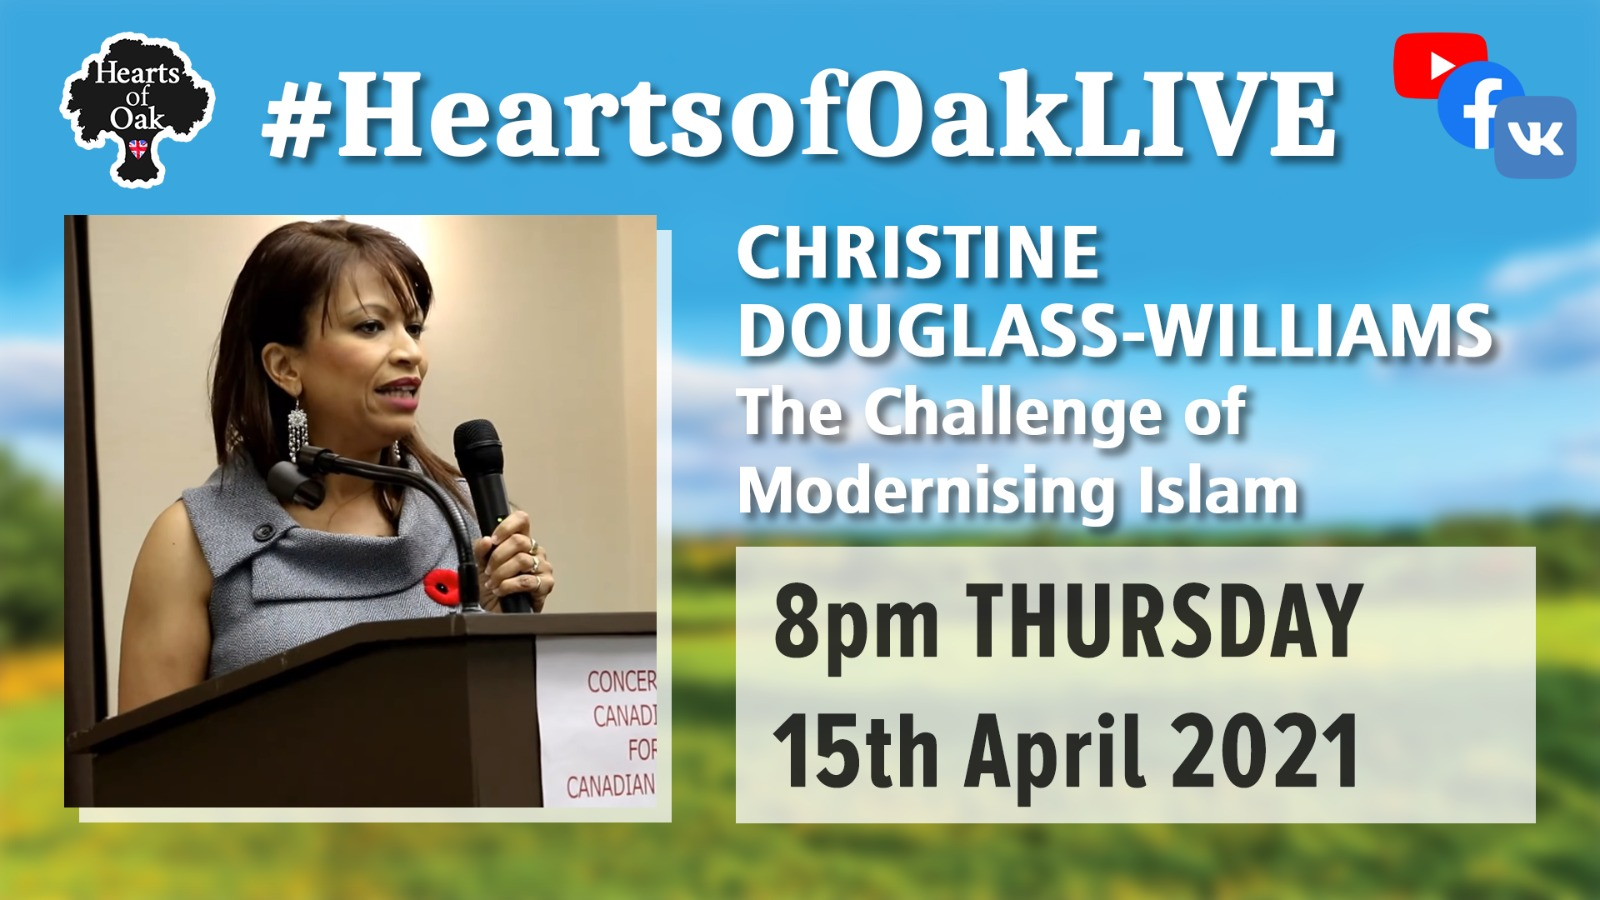 Christine Douglass-Williams: The Challenge of Modernising Islam